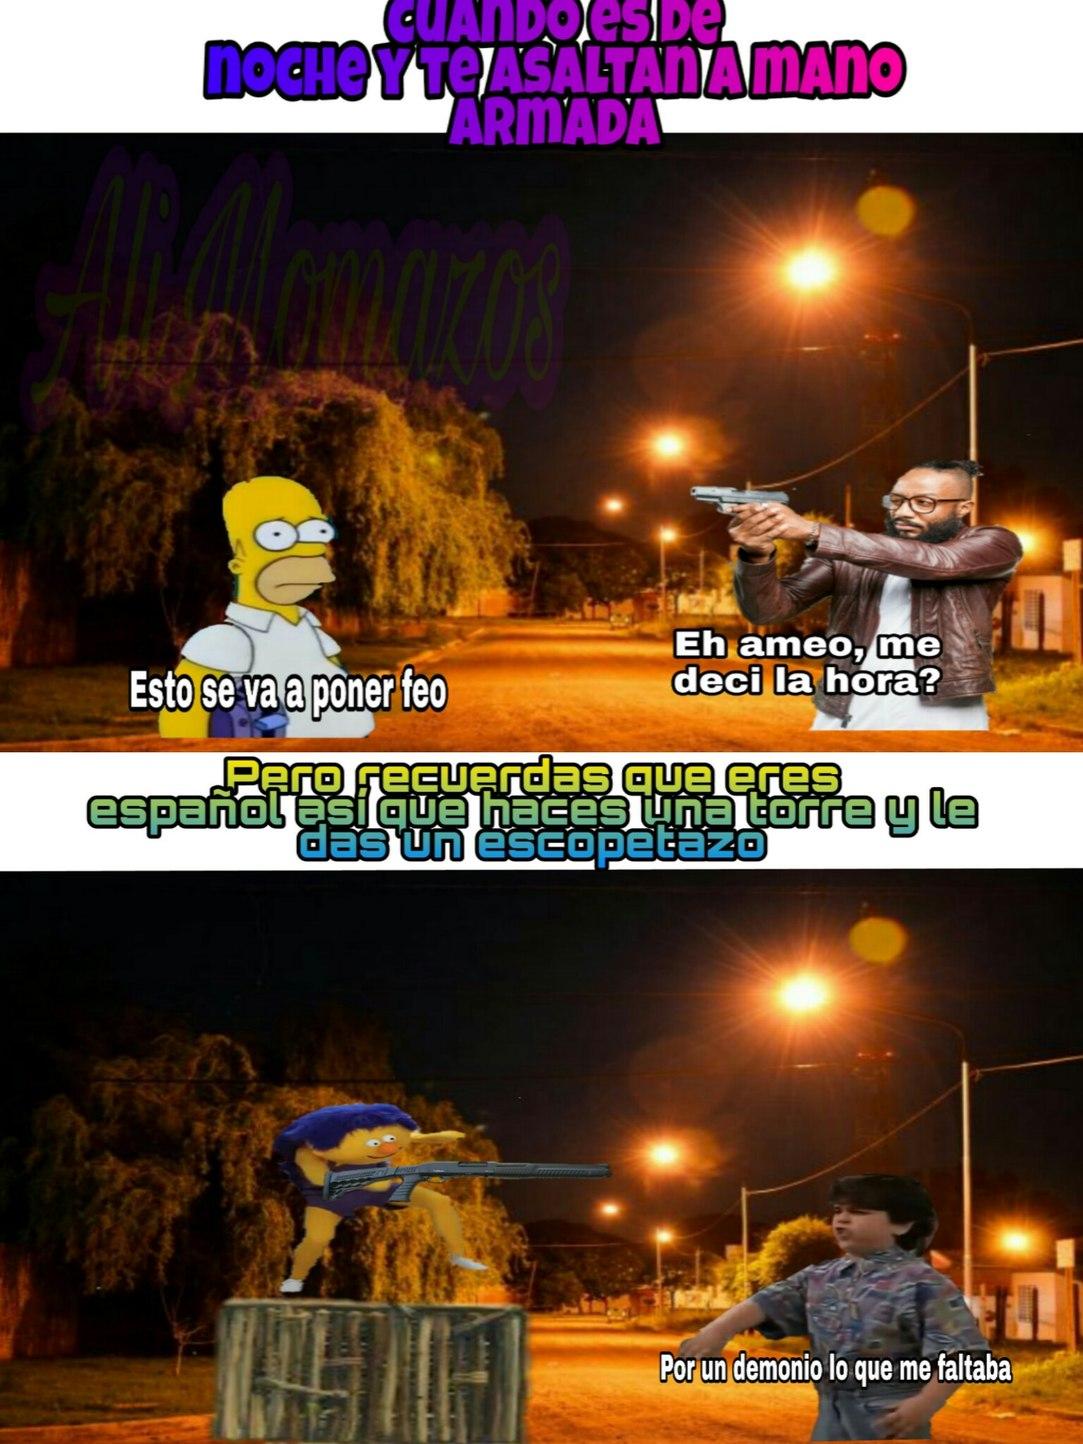 Los españoles seguramente den negativo xd - meme